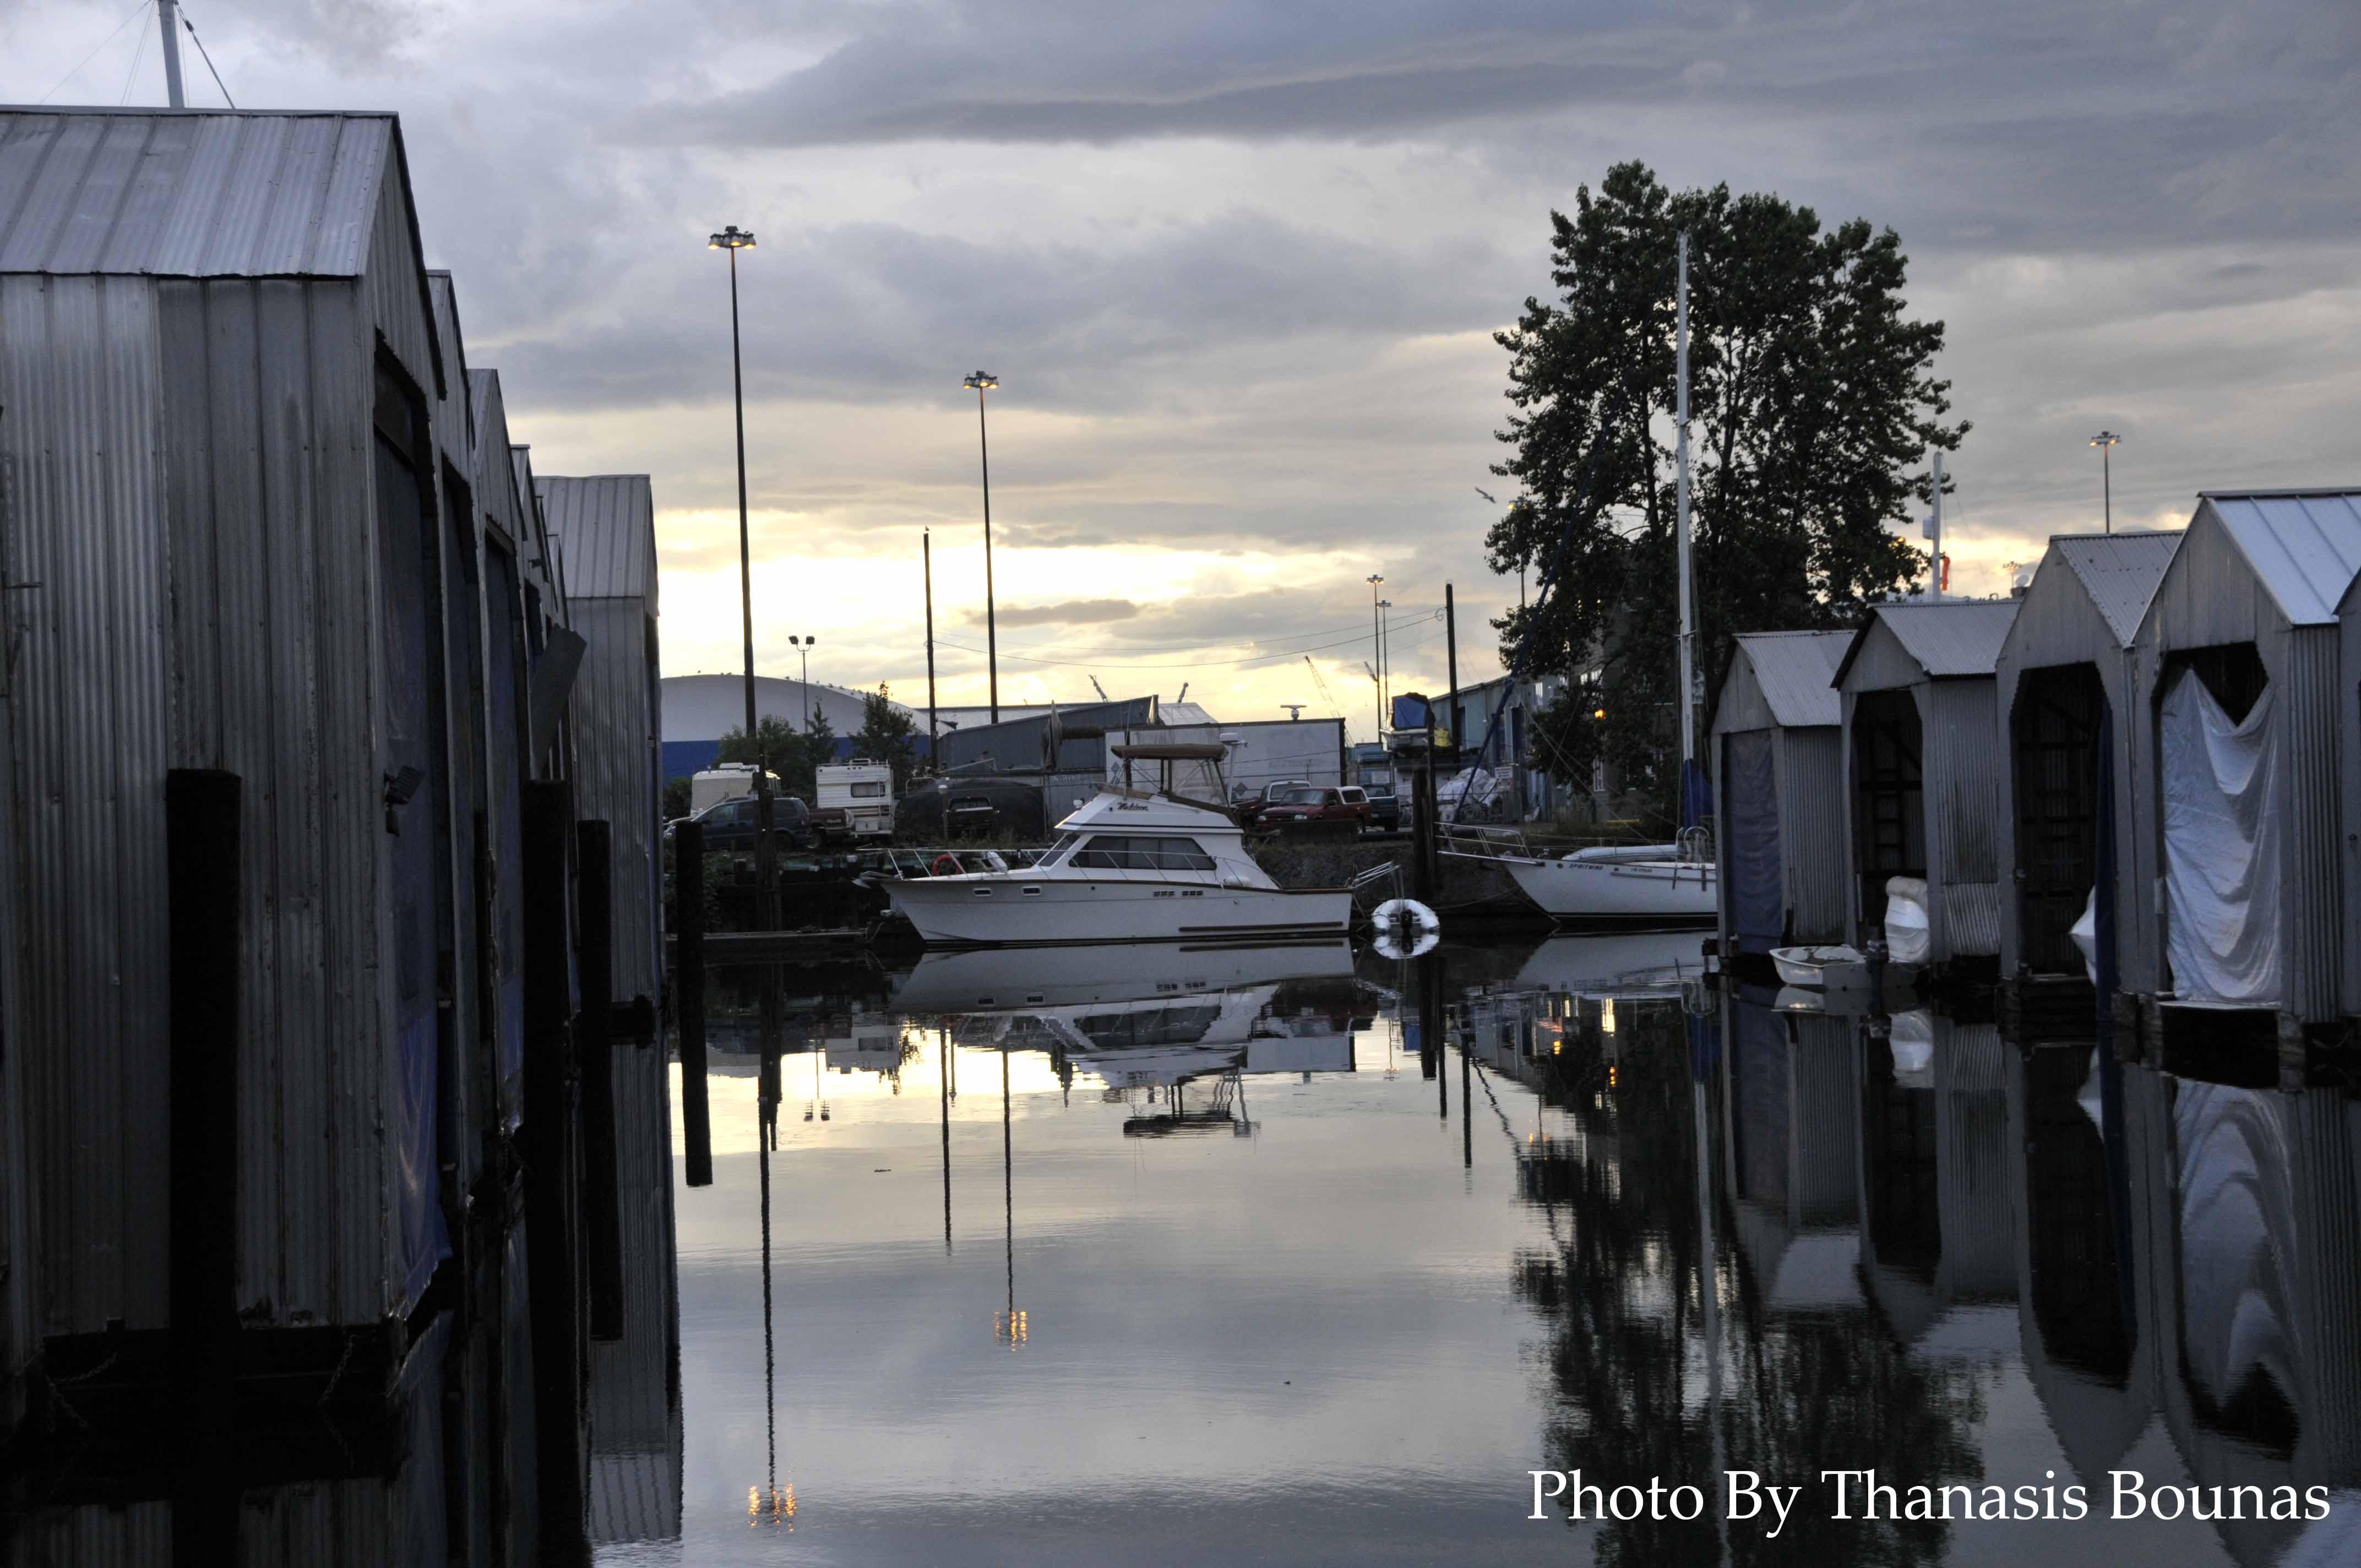 53 North Vancouver Beautiful British Columbia Photo By Thanasis Bounas